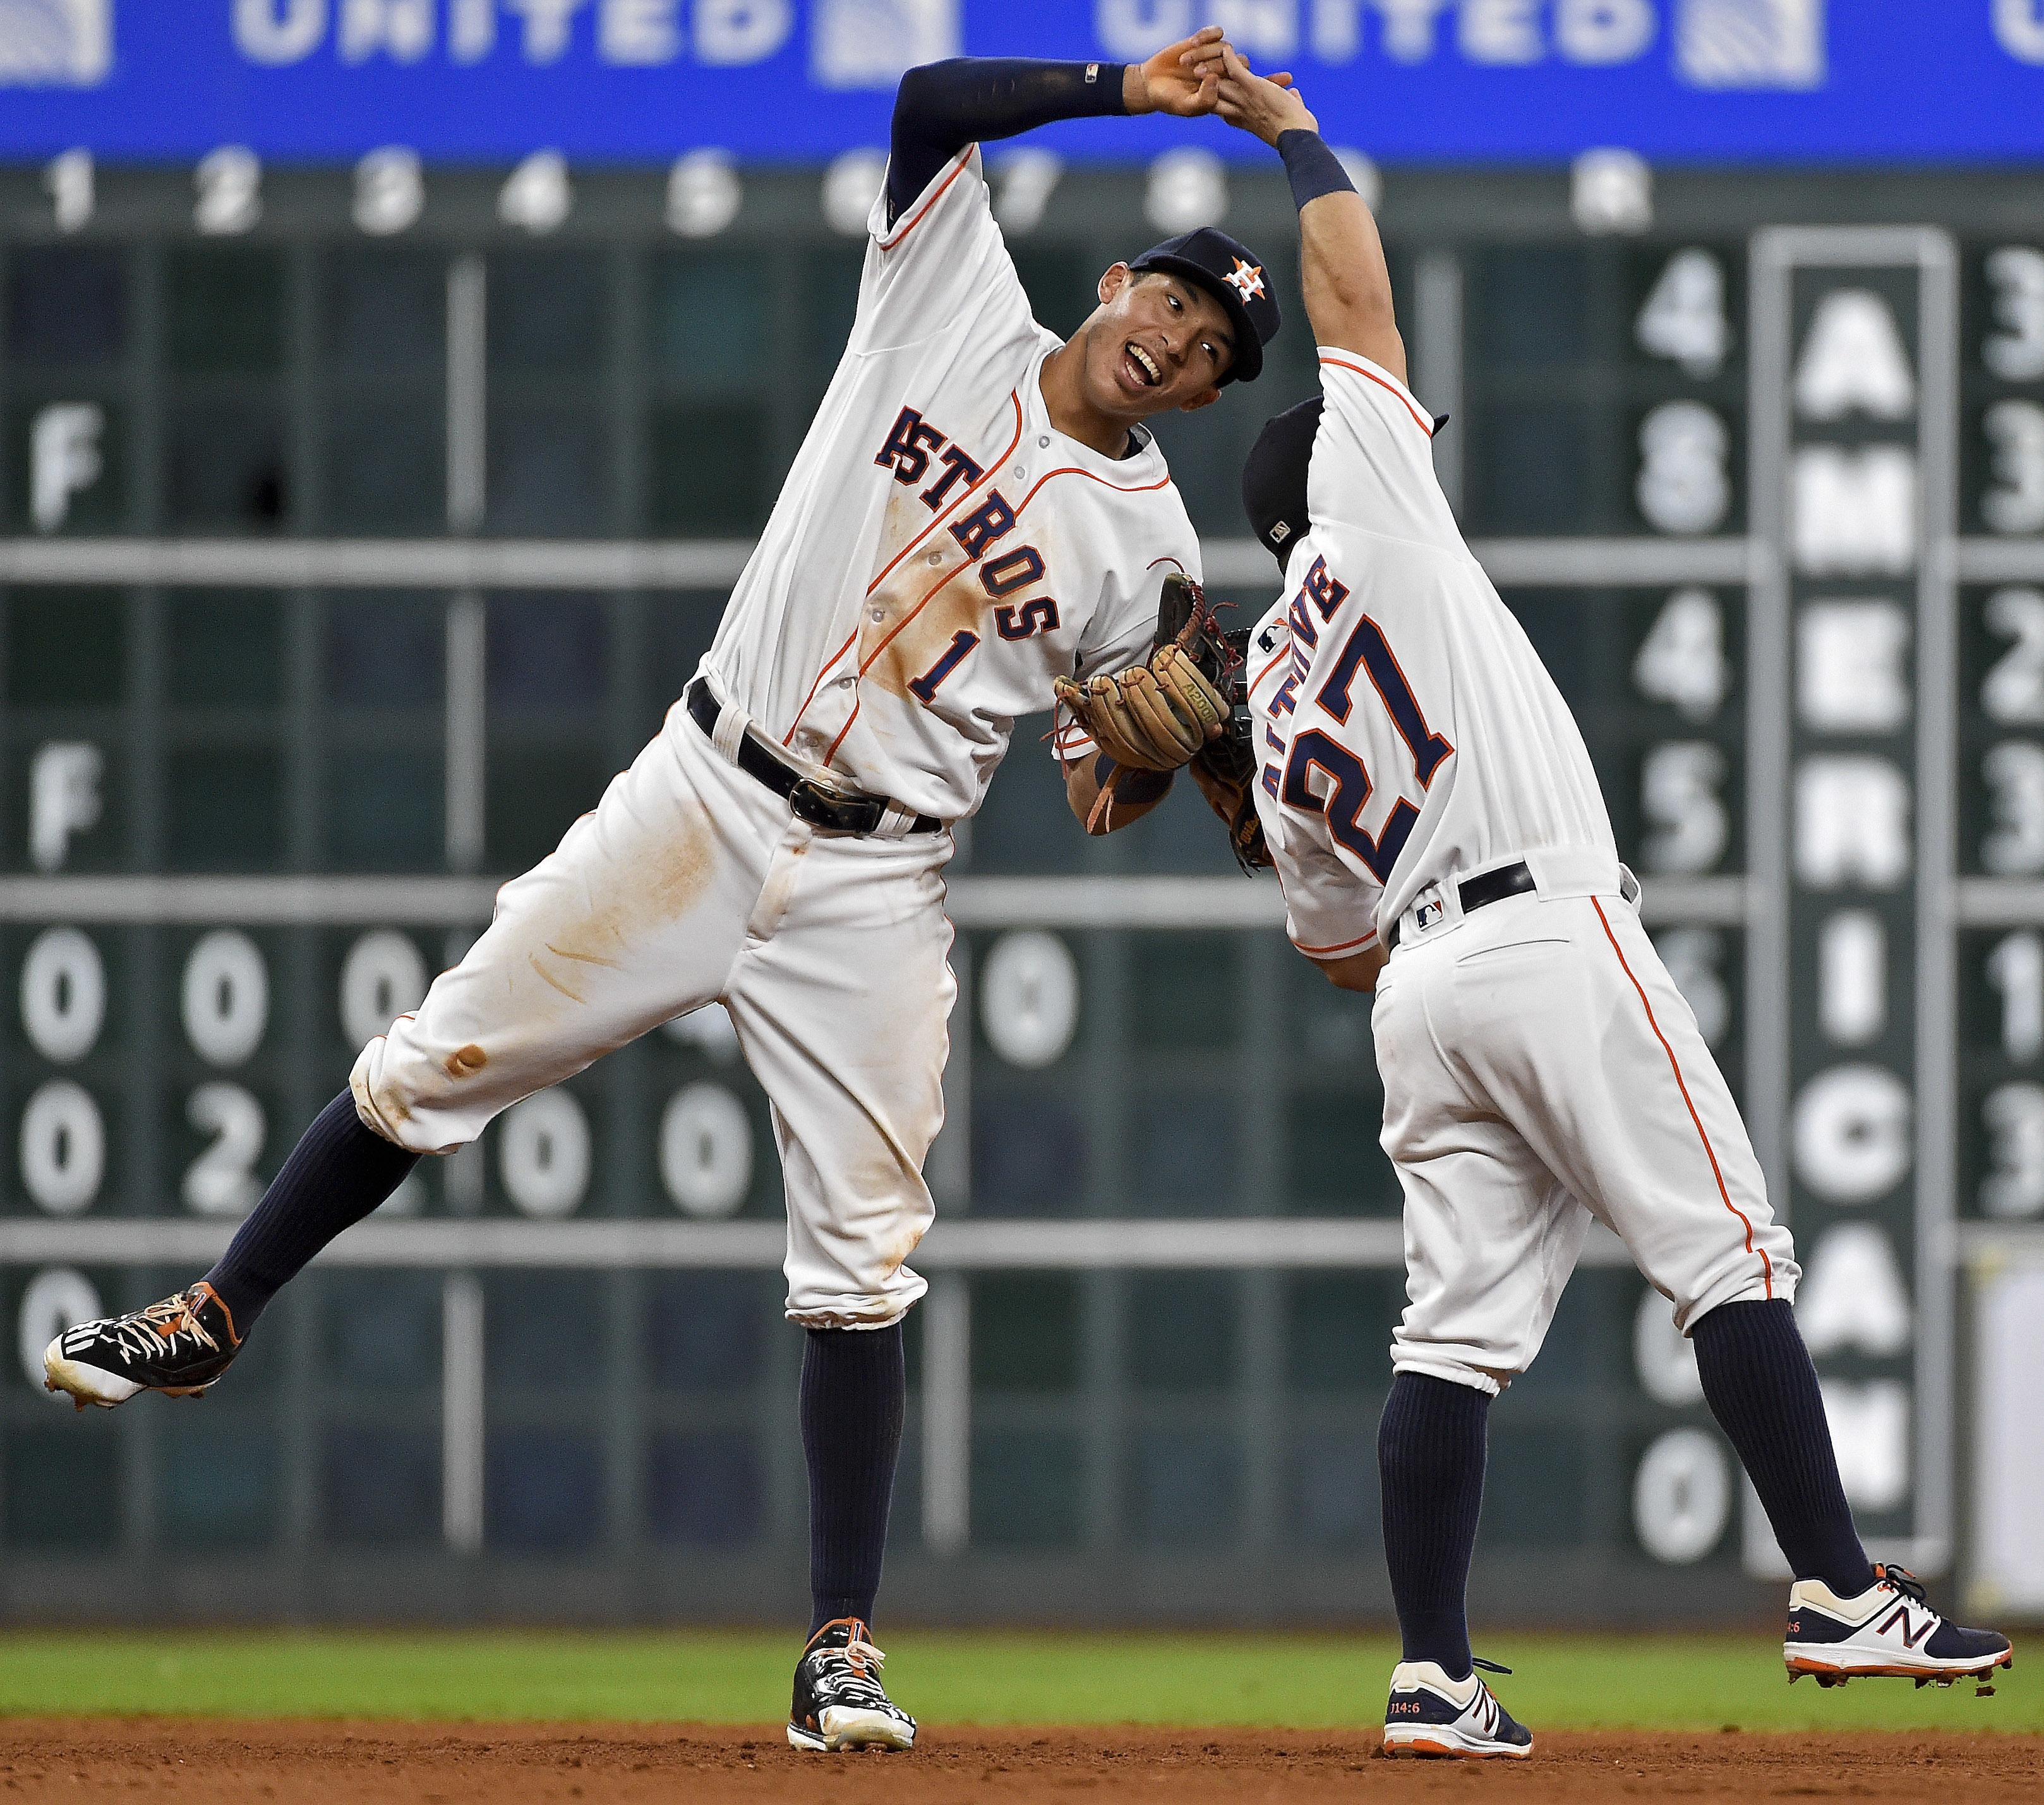 Baseball_2017_whos_next_15485